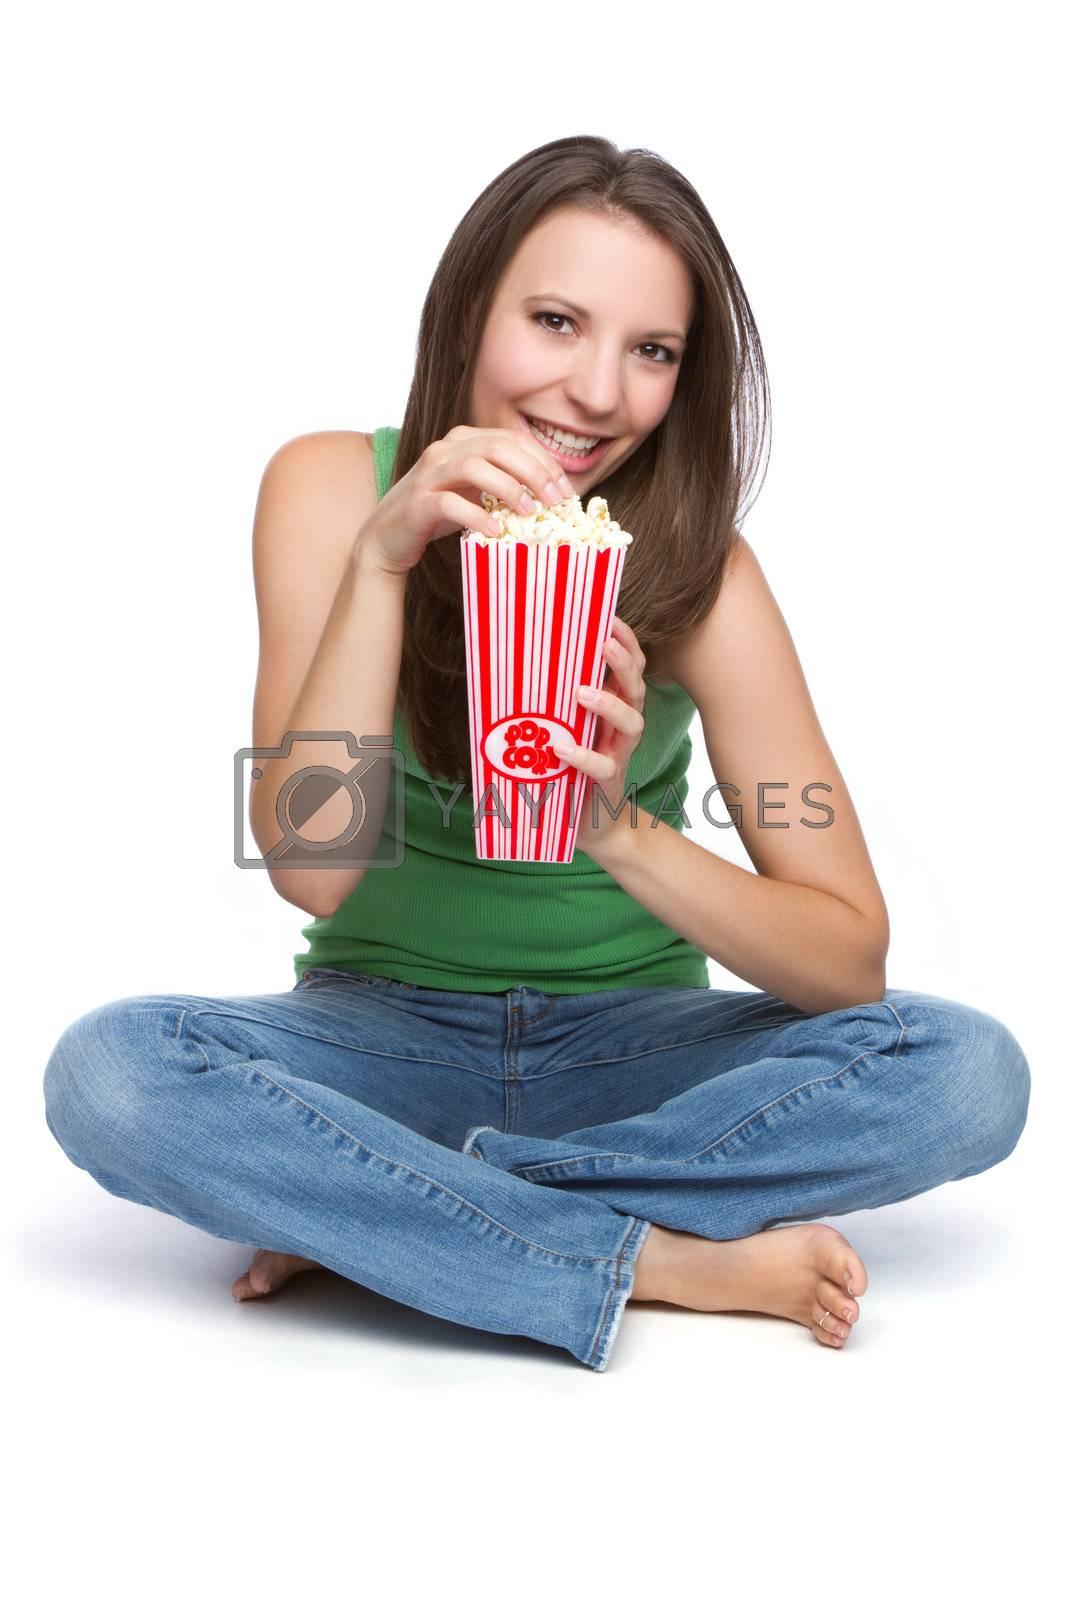 Pretty teen girl eating popcorn